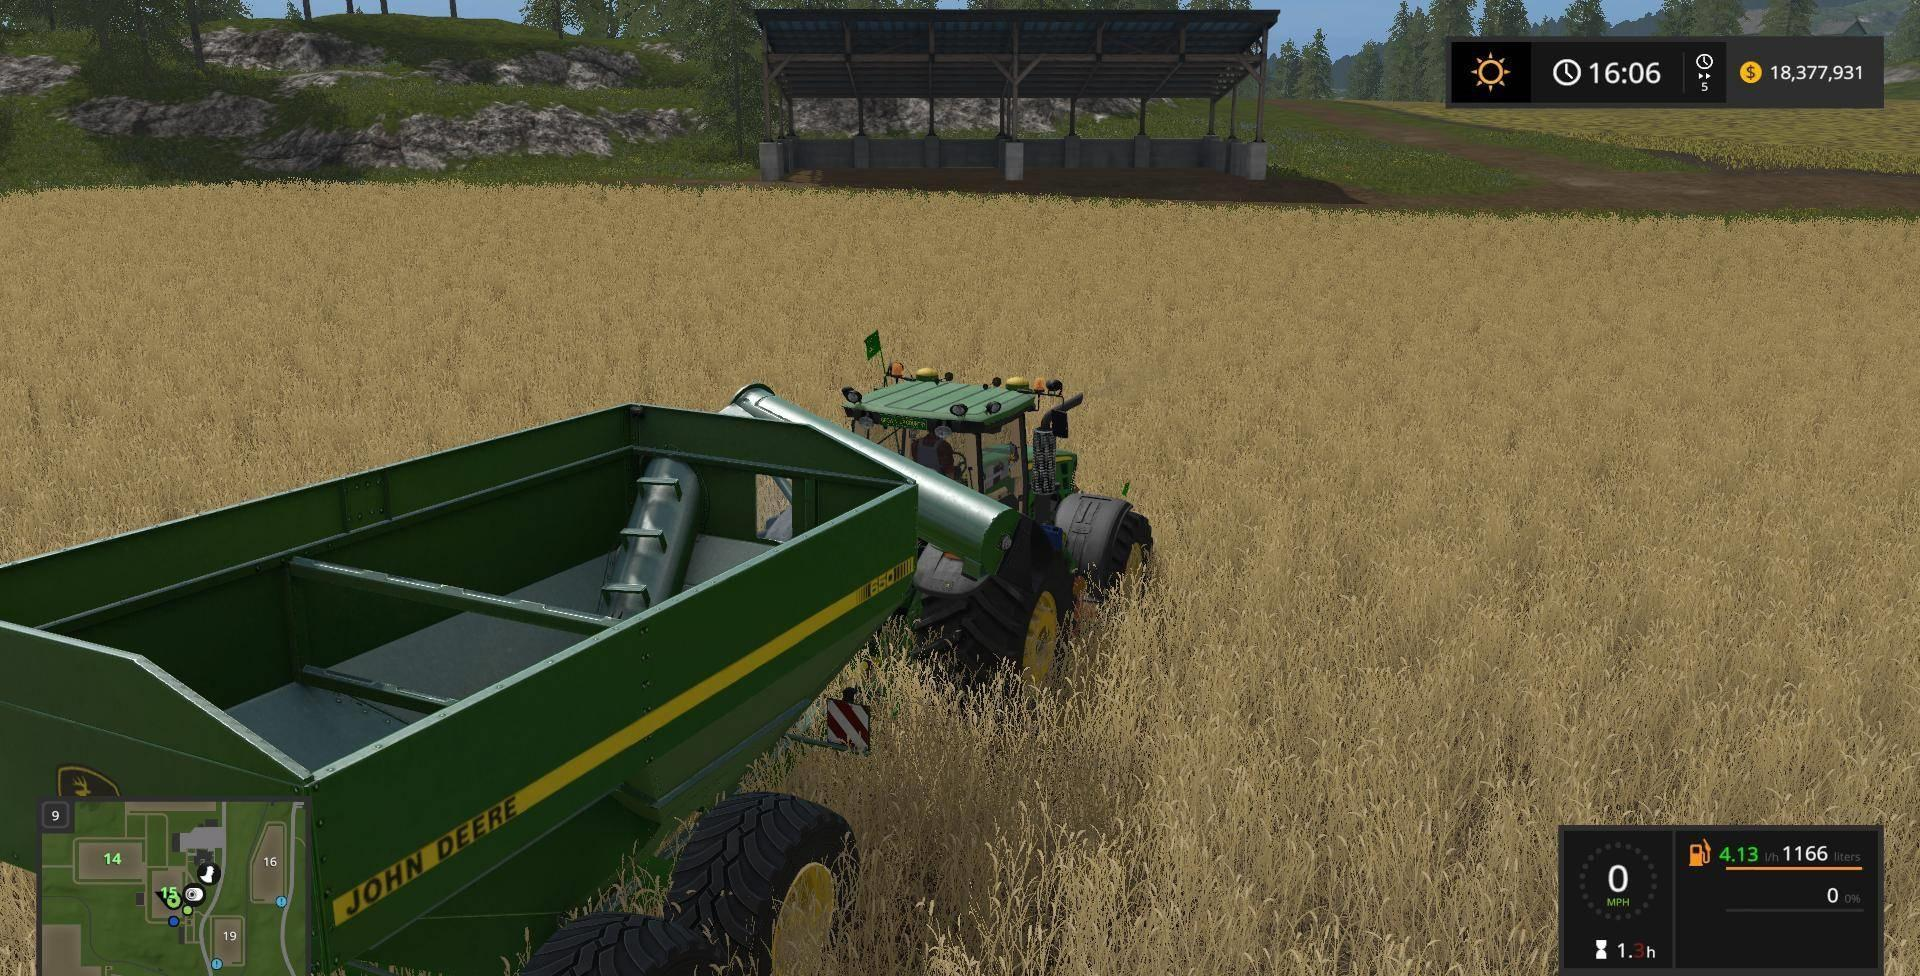 Trailers - Farming simulator 17 mods | FS17 Mods » Page 87